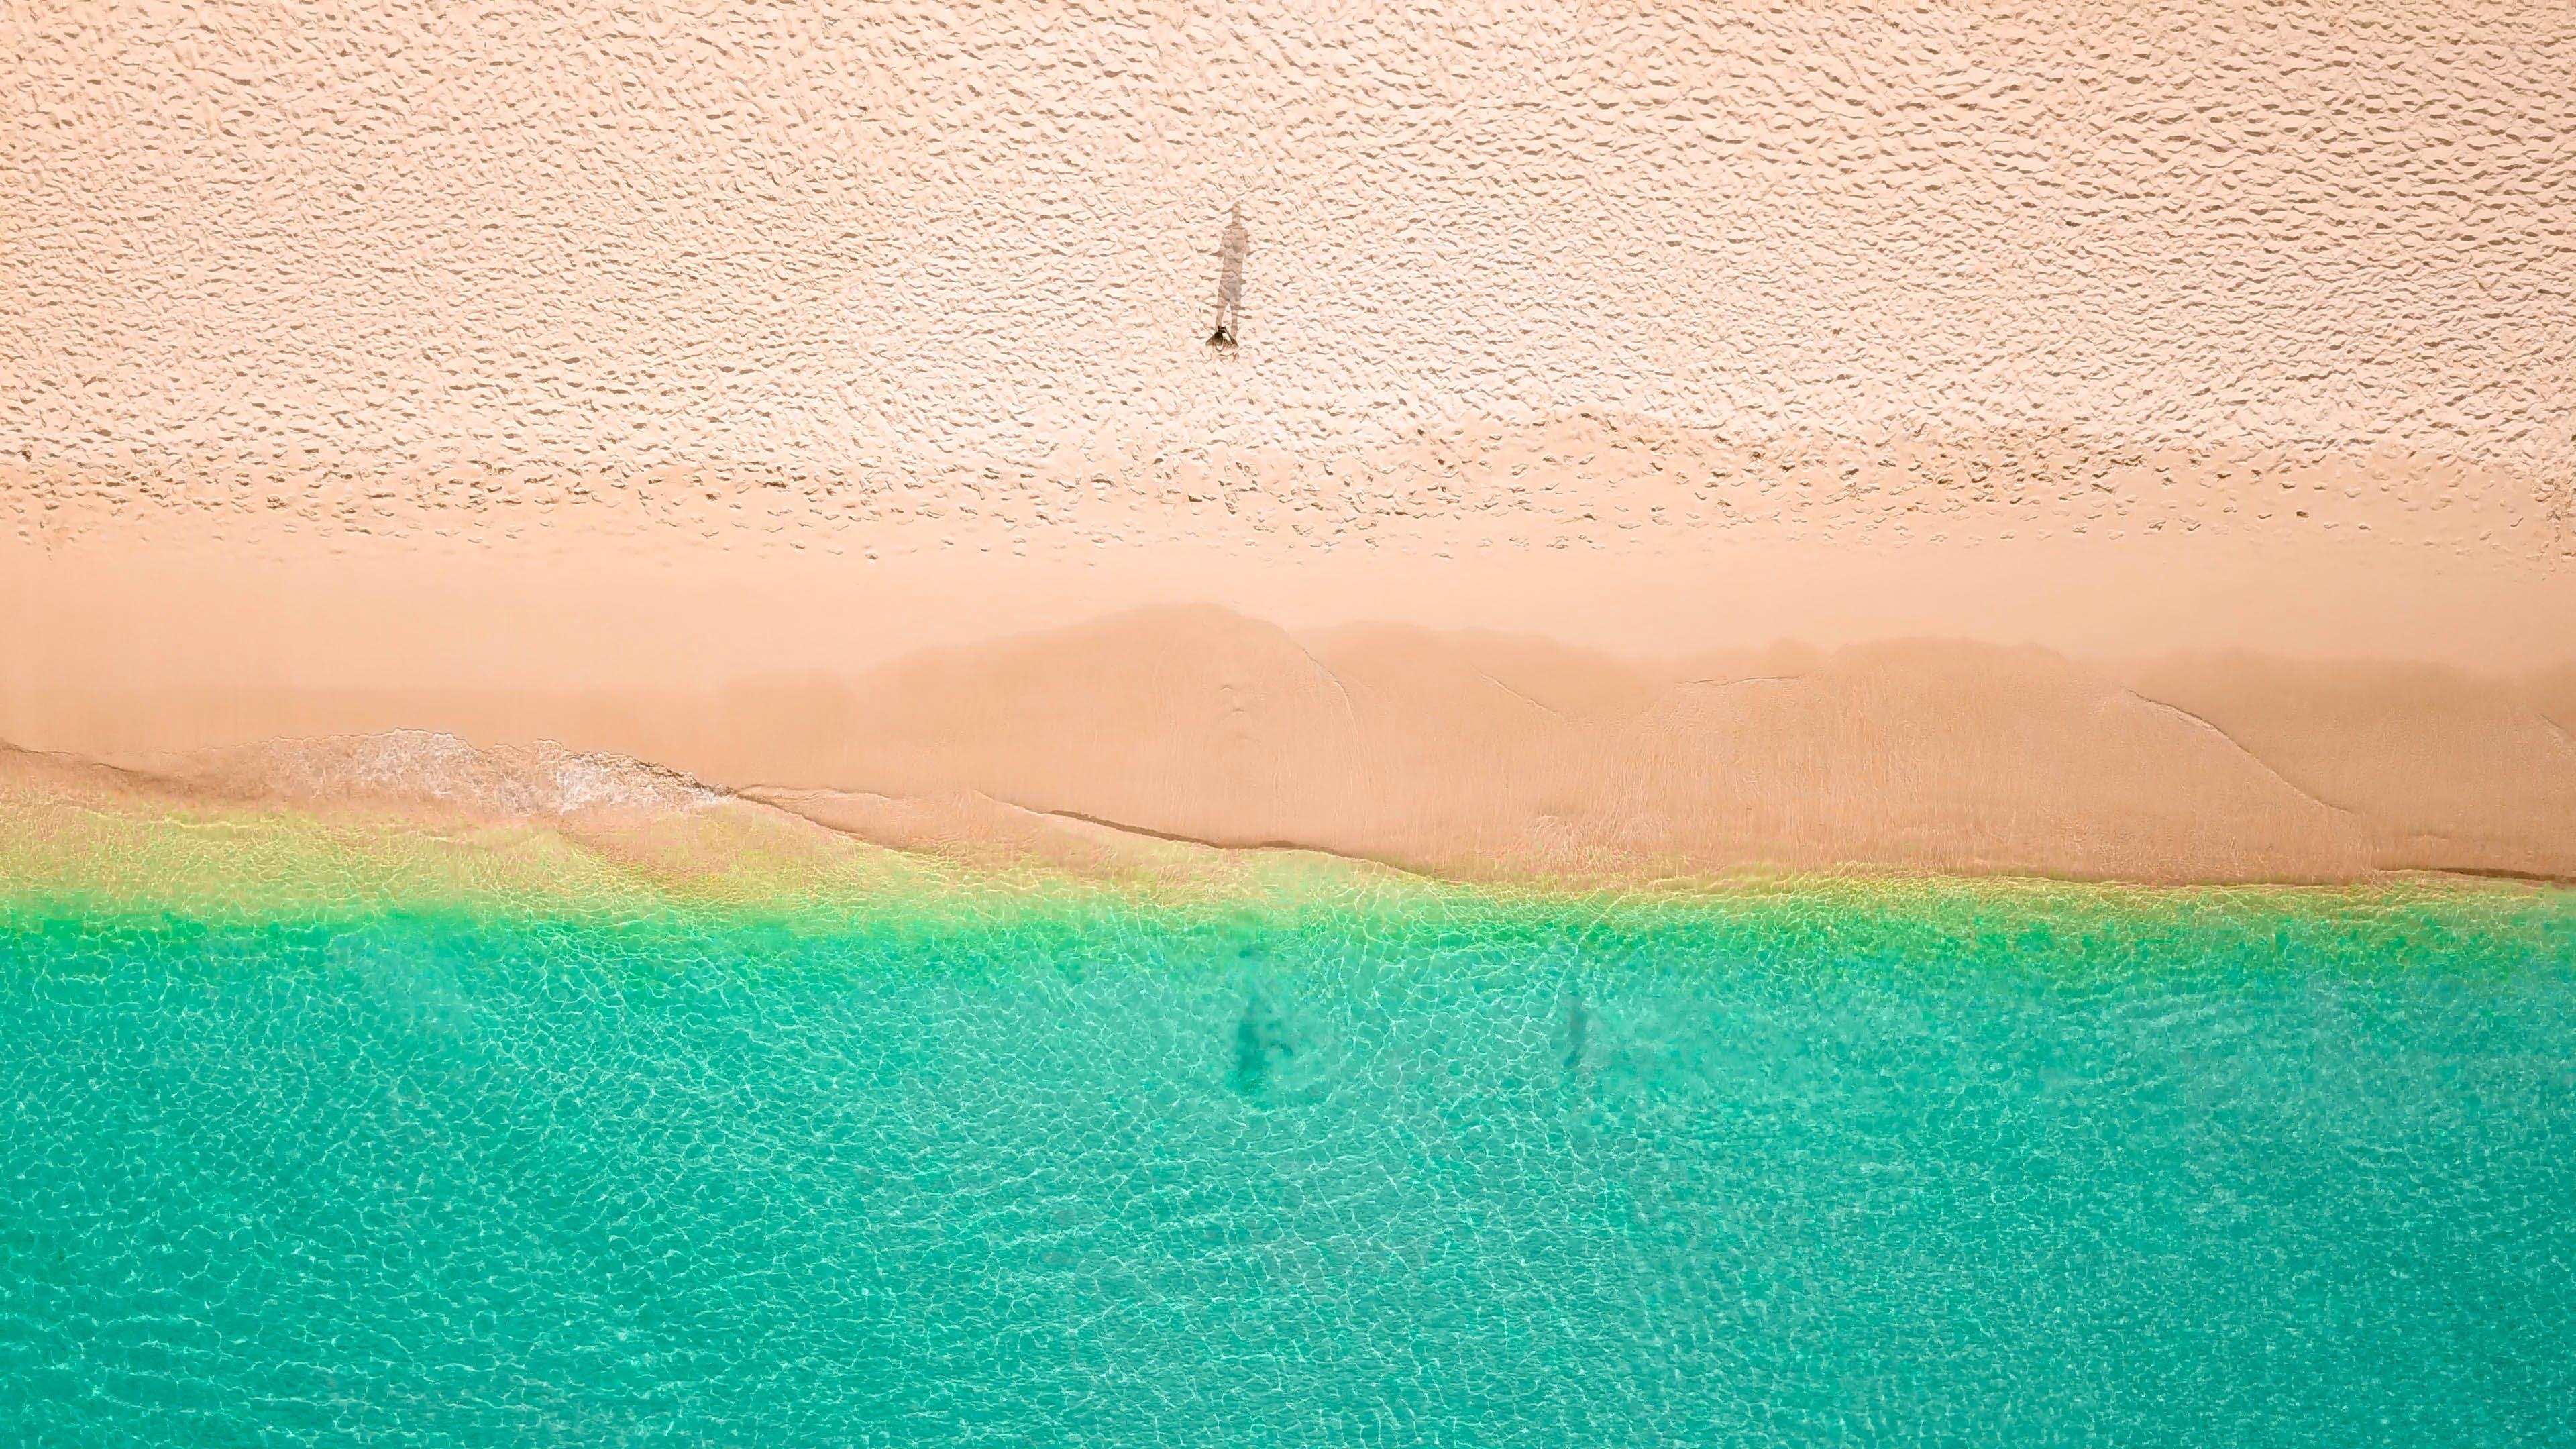 Gratis arkivbilde med bølger, dagtid, dronebilde, flyfotografering